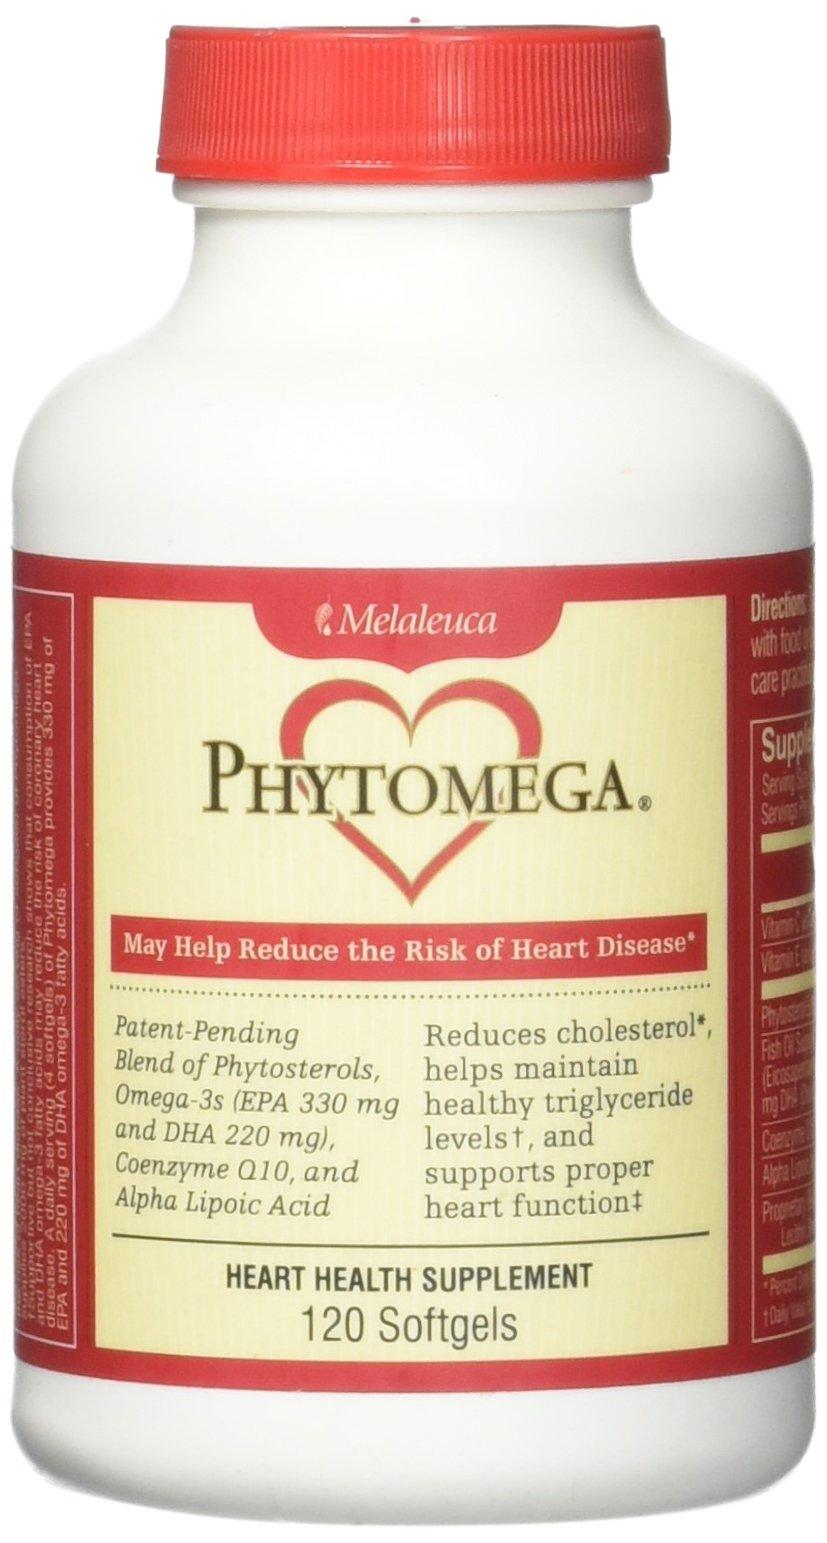 Phytomega Heart Health Supplement 120 Softgels. by Melaleuca